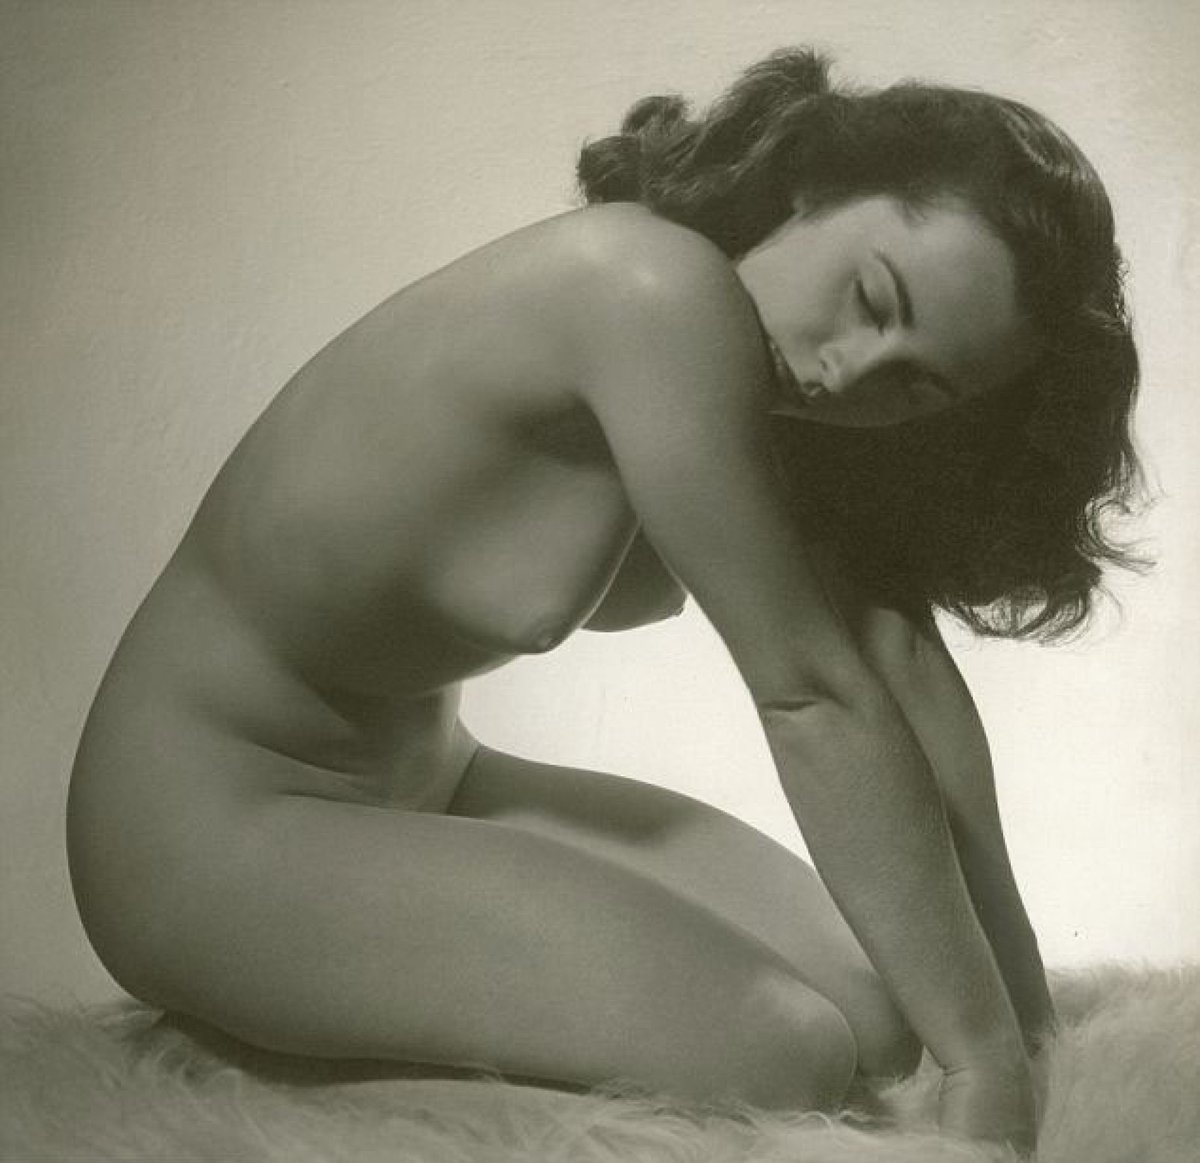 Elizabeth wong's nude photos